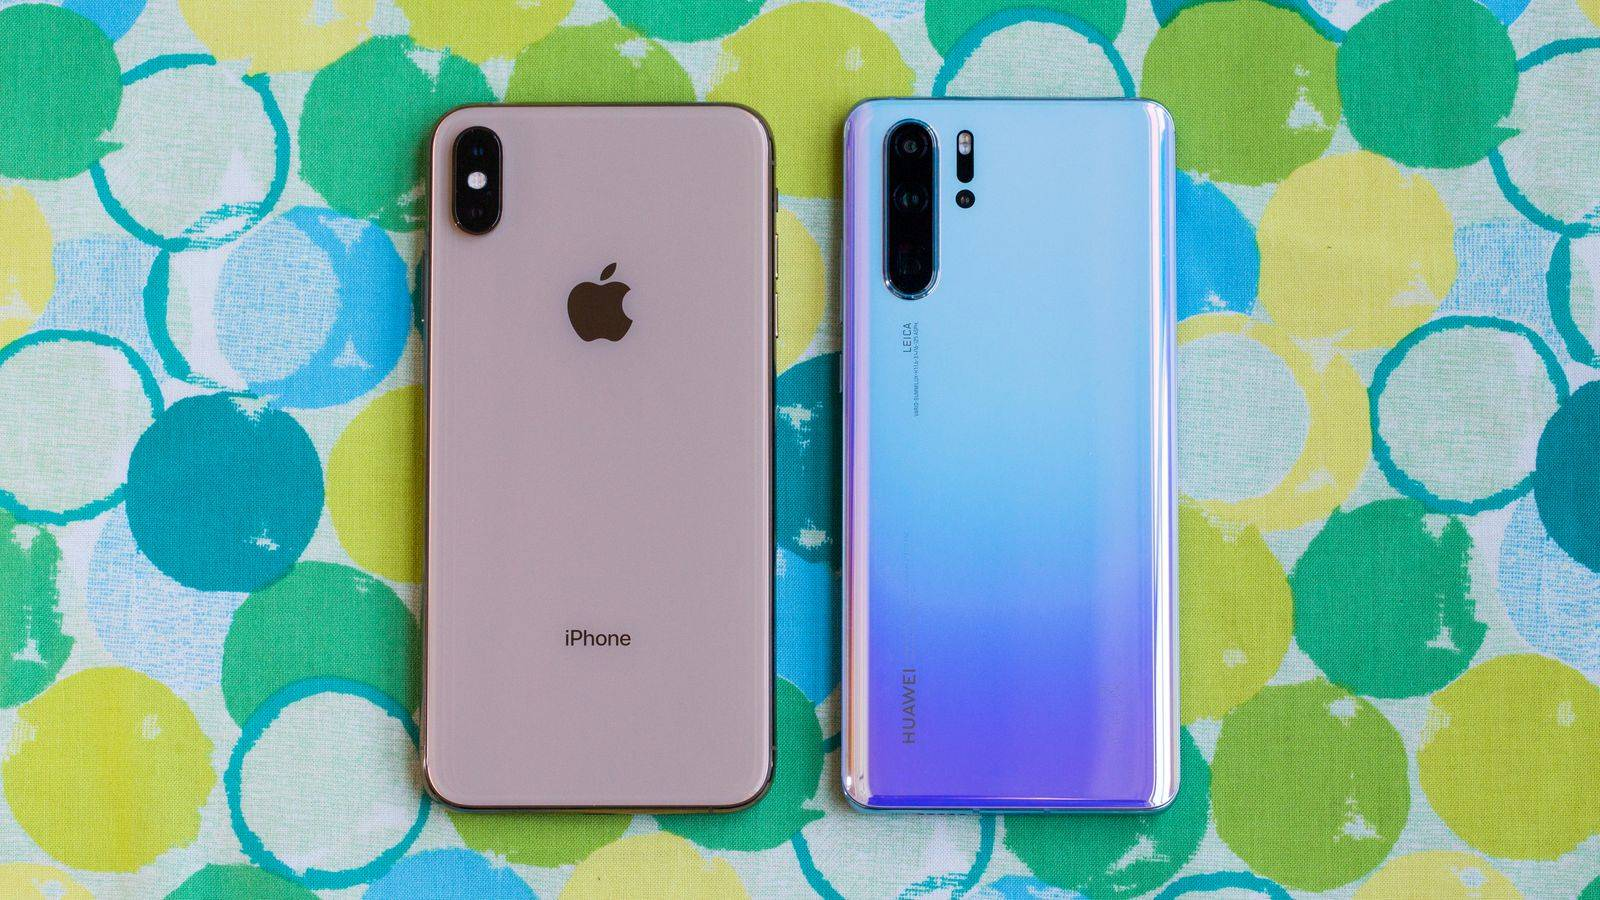 Apple Huawei fiabilitate telefoane europa